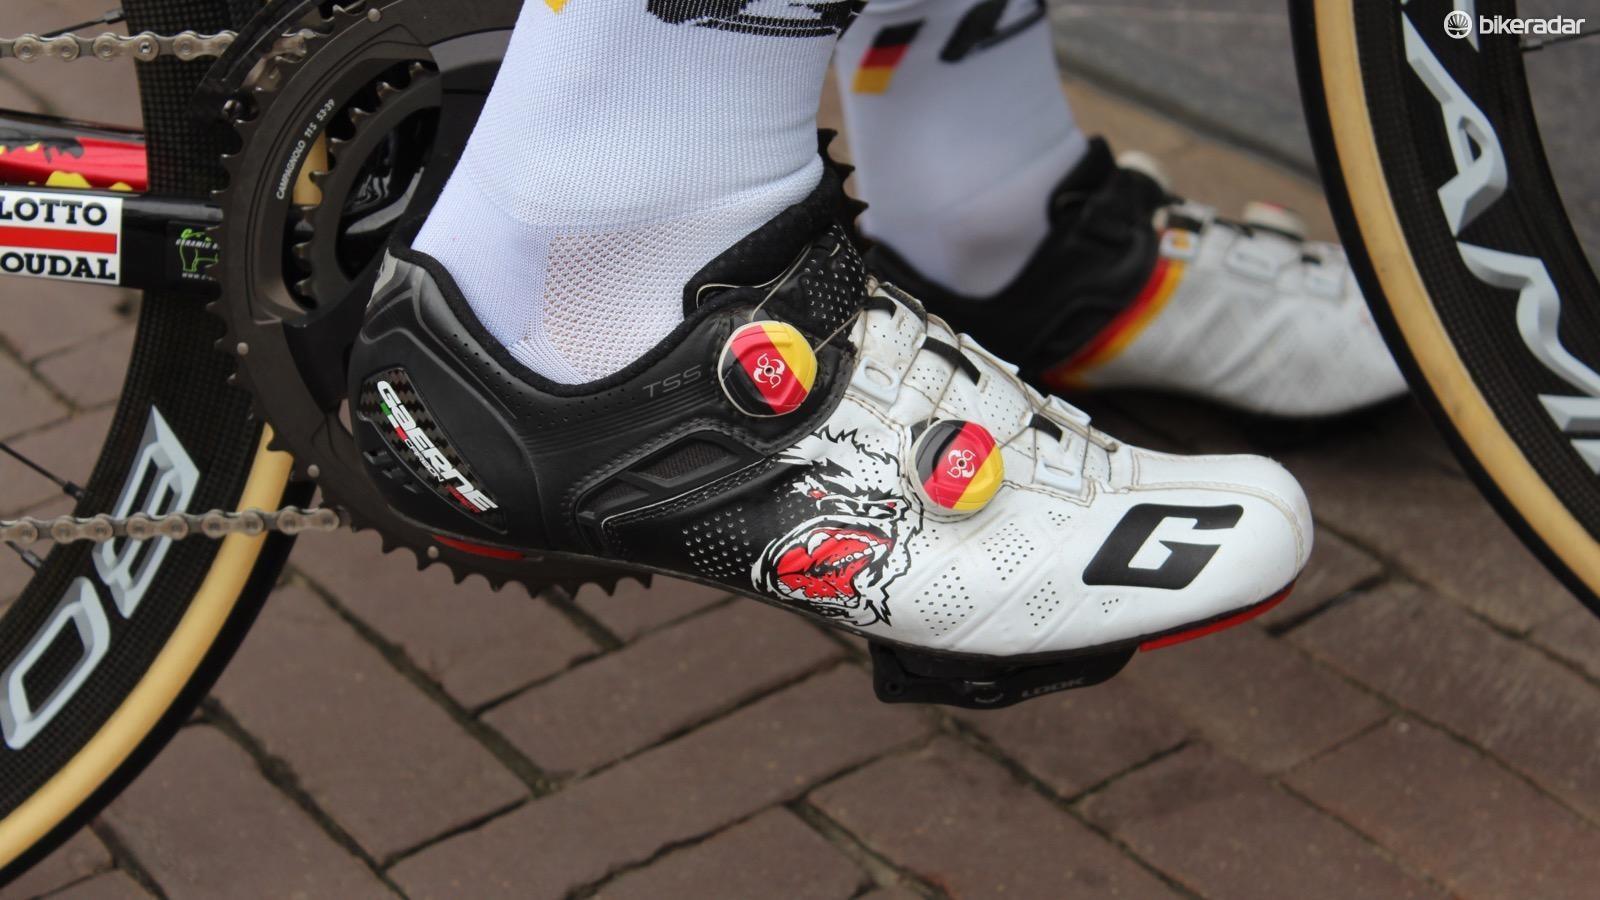 top-5-pro-shoes-7-1494382594738-154lvho86r76e-bb84e36